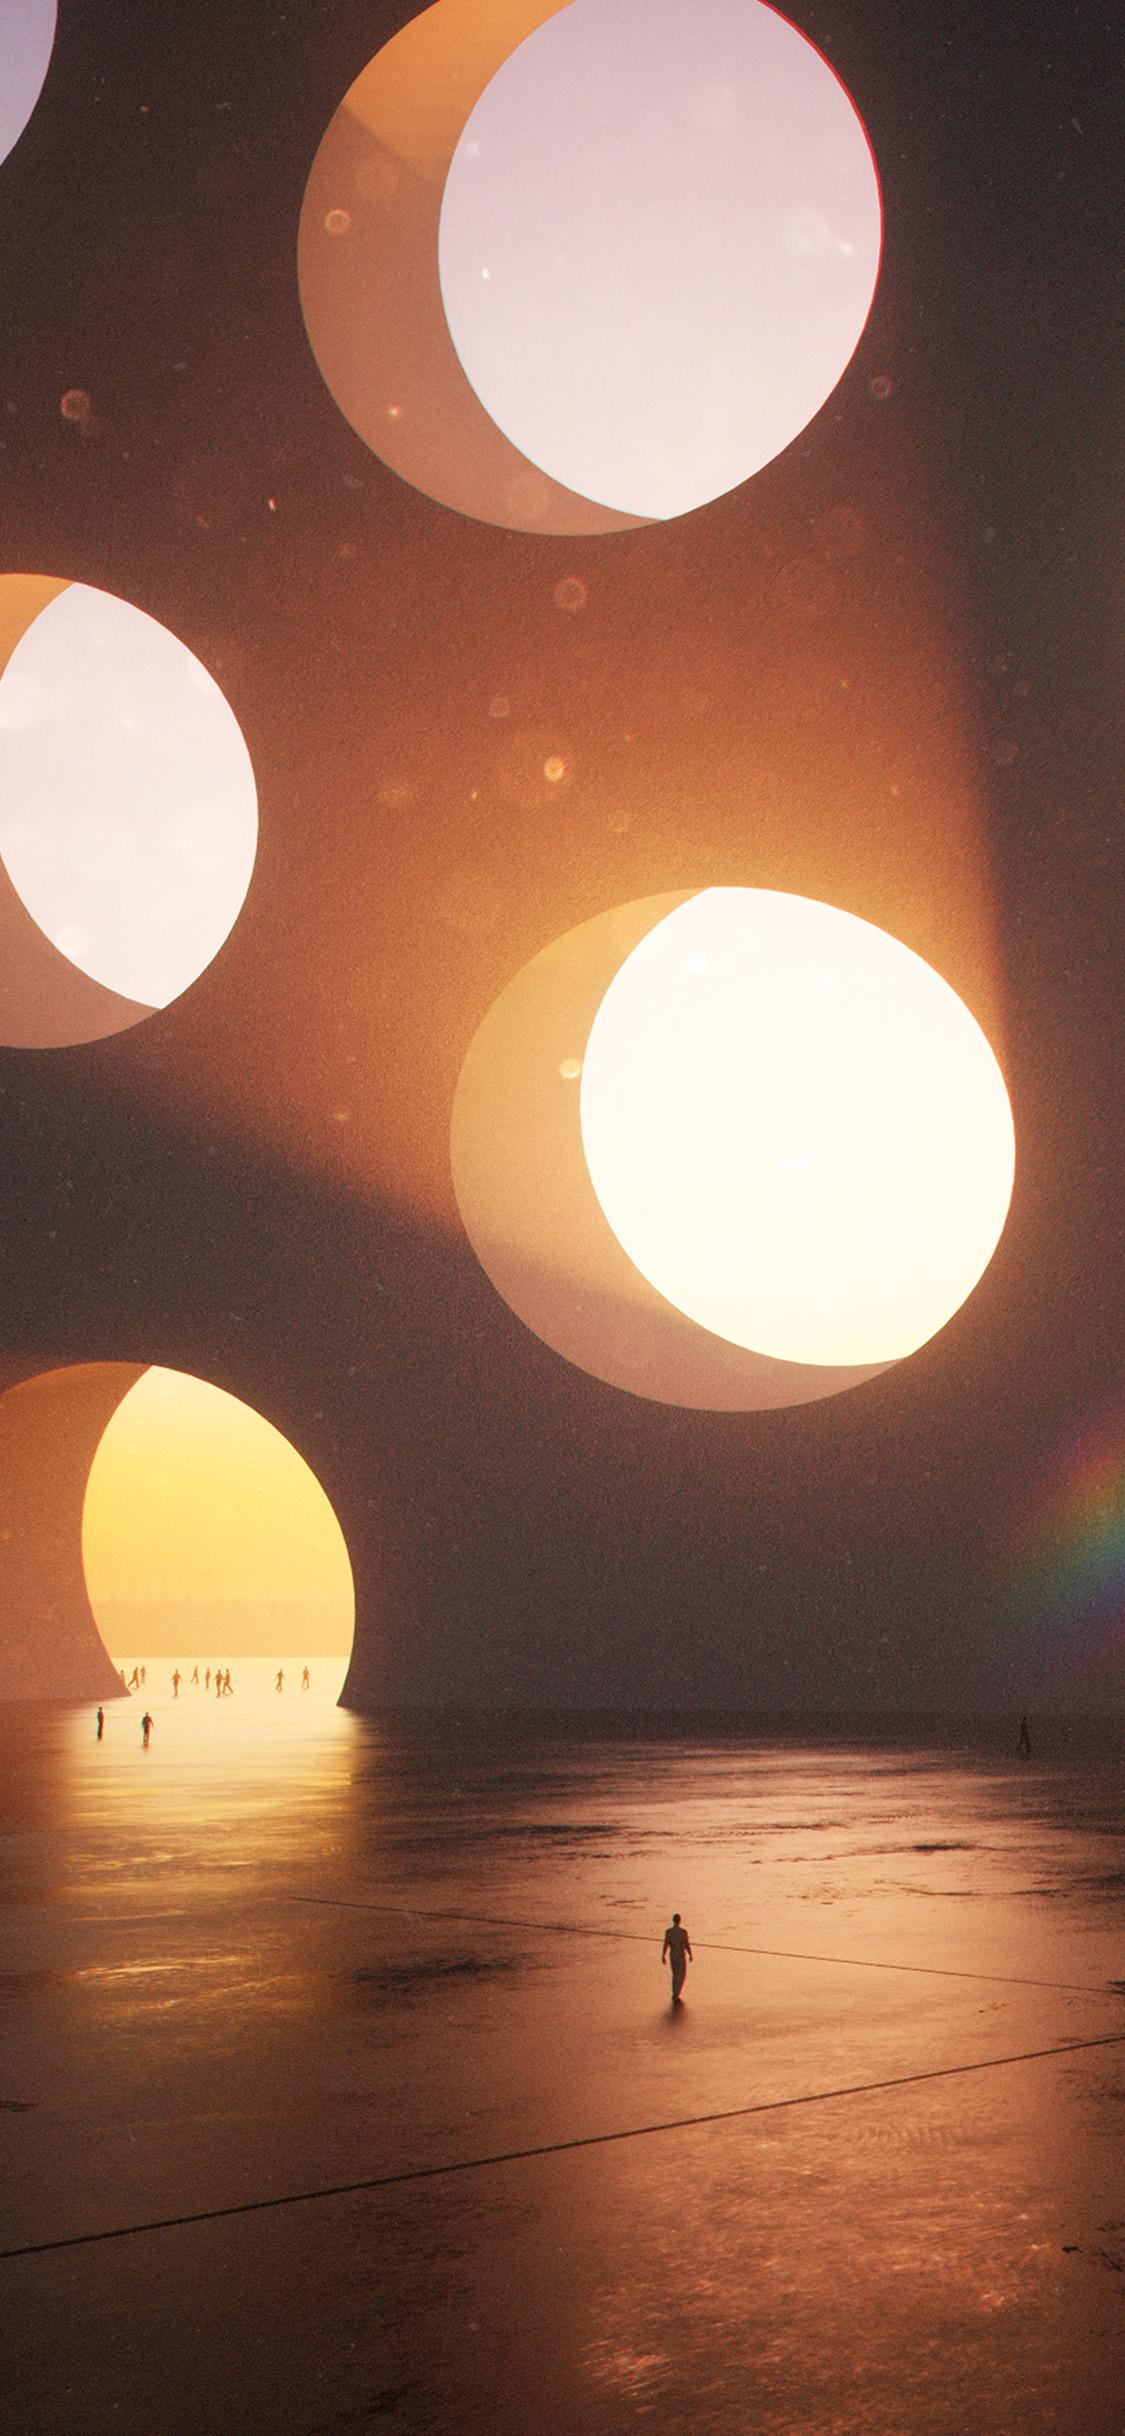 iPhonexpapers.com-Apple-iPhone-wallpaper-be04-space-stuart-fantacy-art-illustration